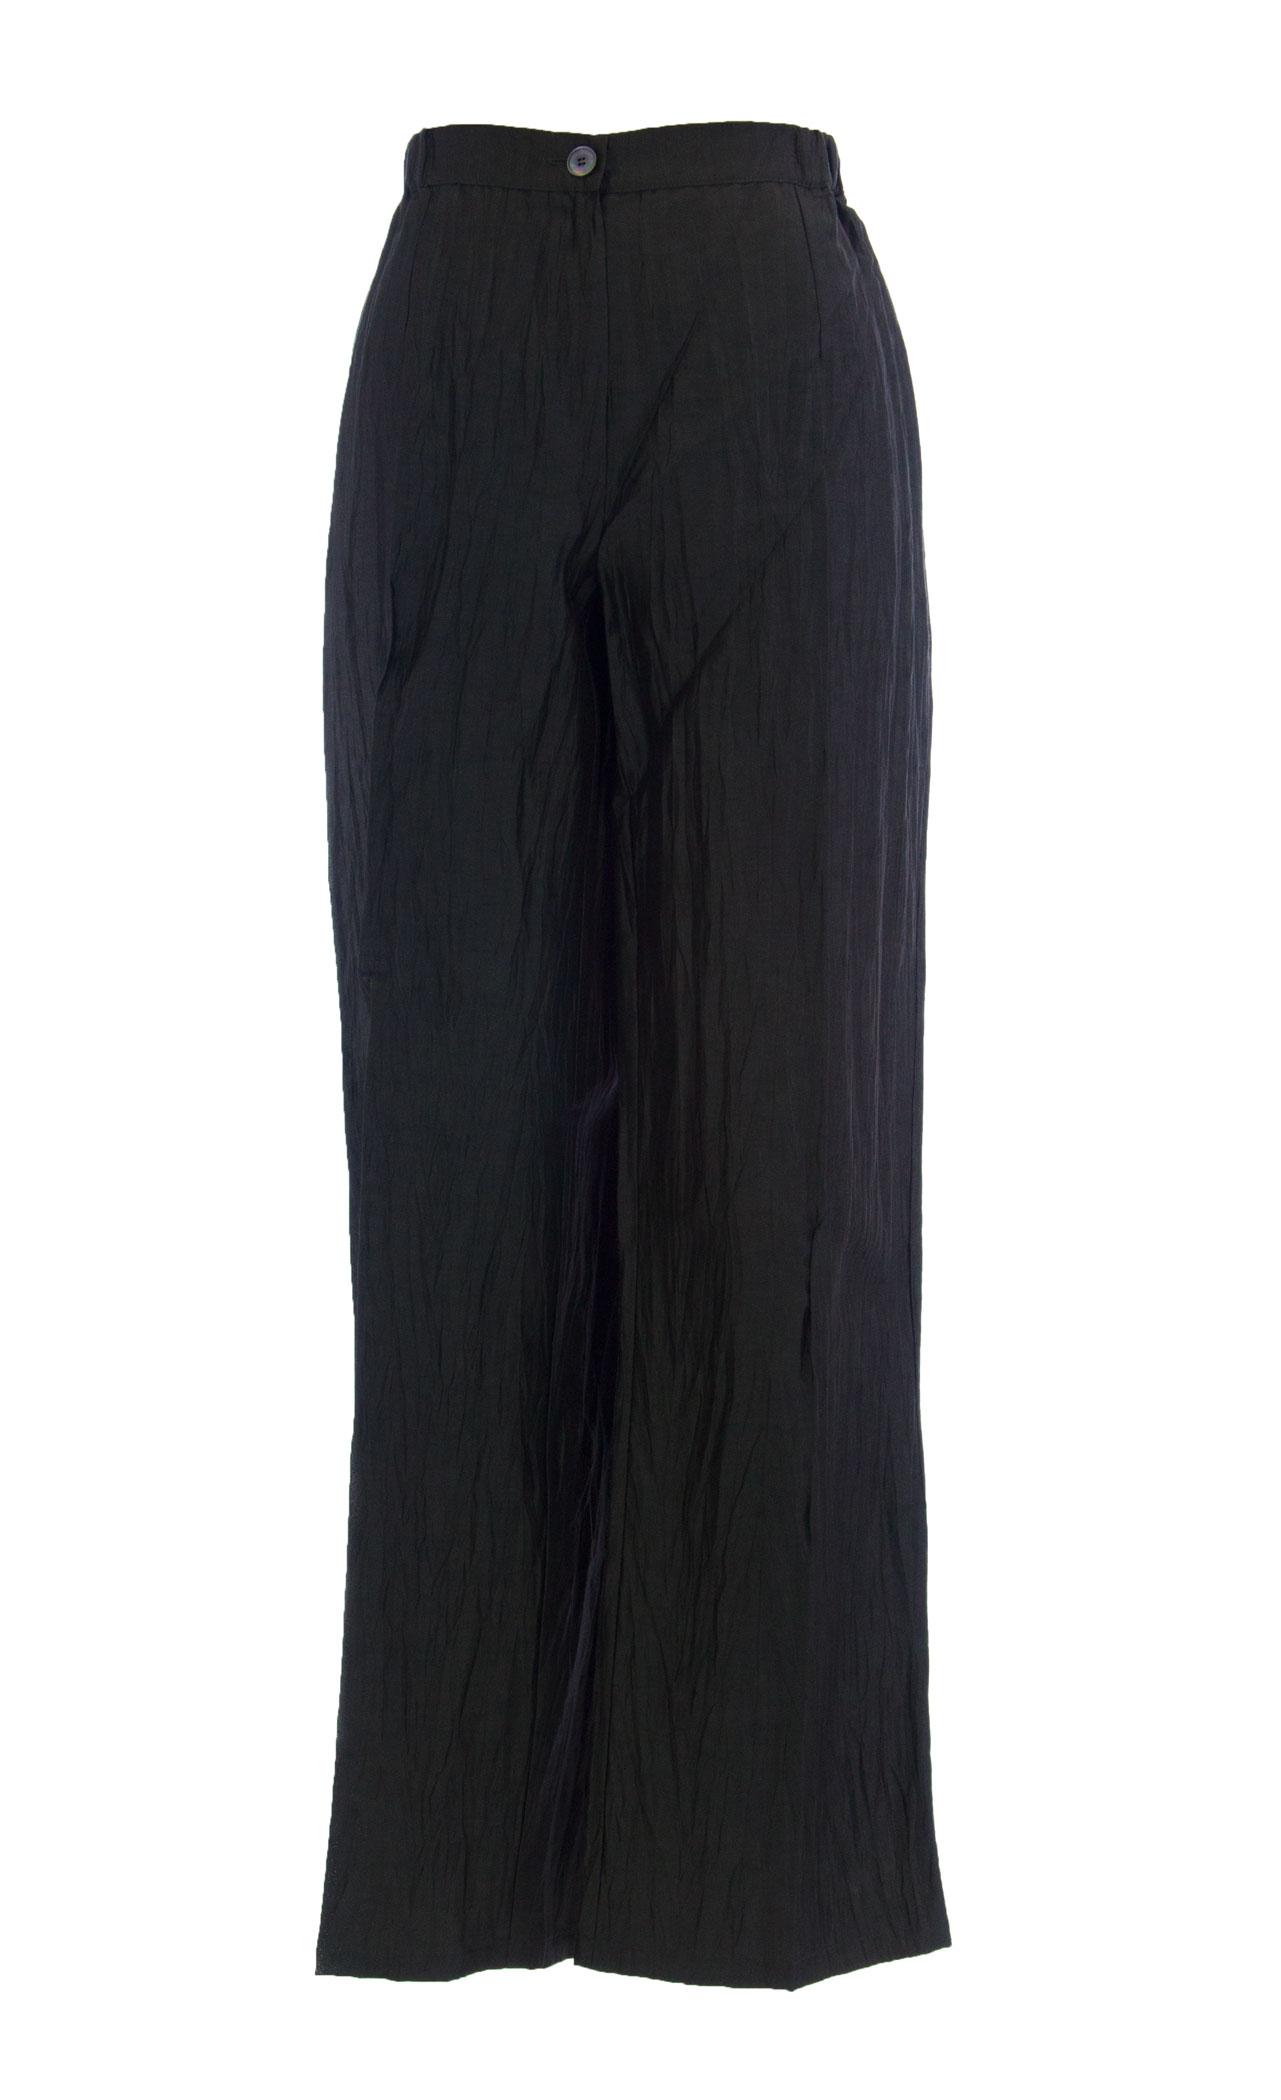 MARINA RINALDI by MaxMara Byte Olive Pre-Wrinkled Elastic Waist Dress Pants $465